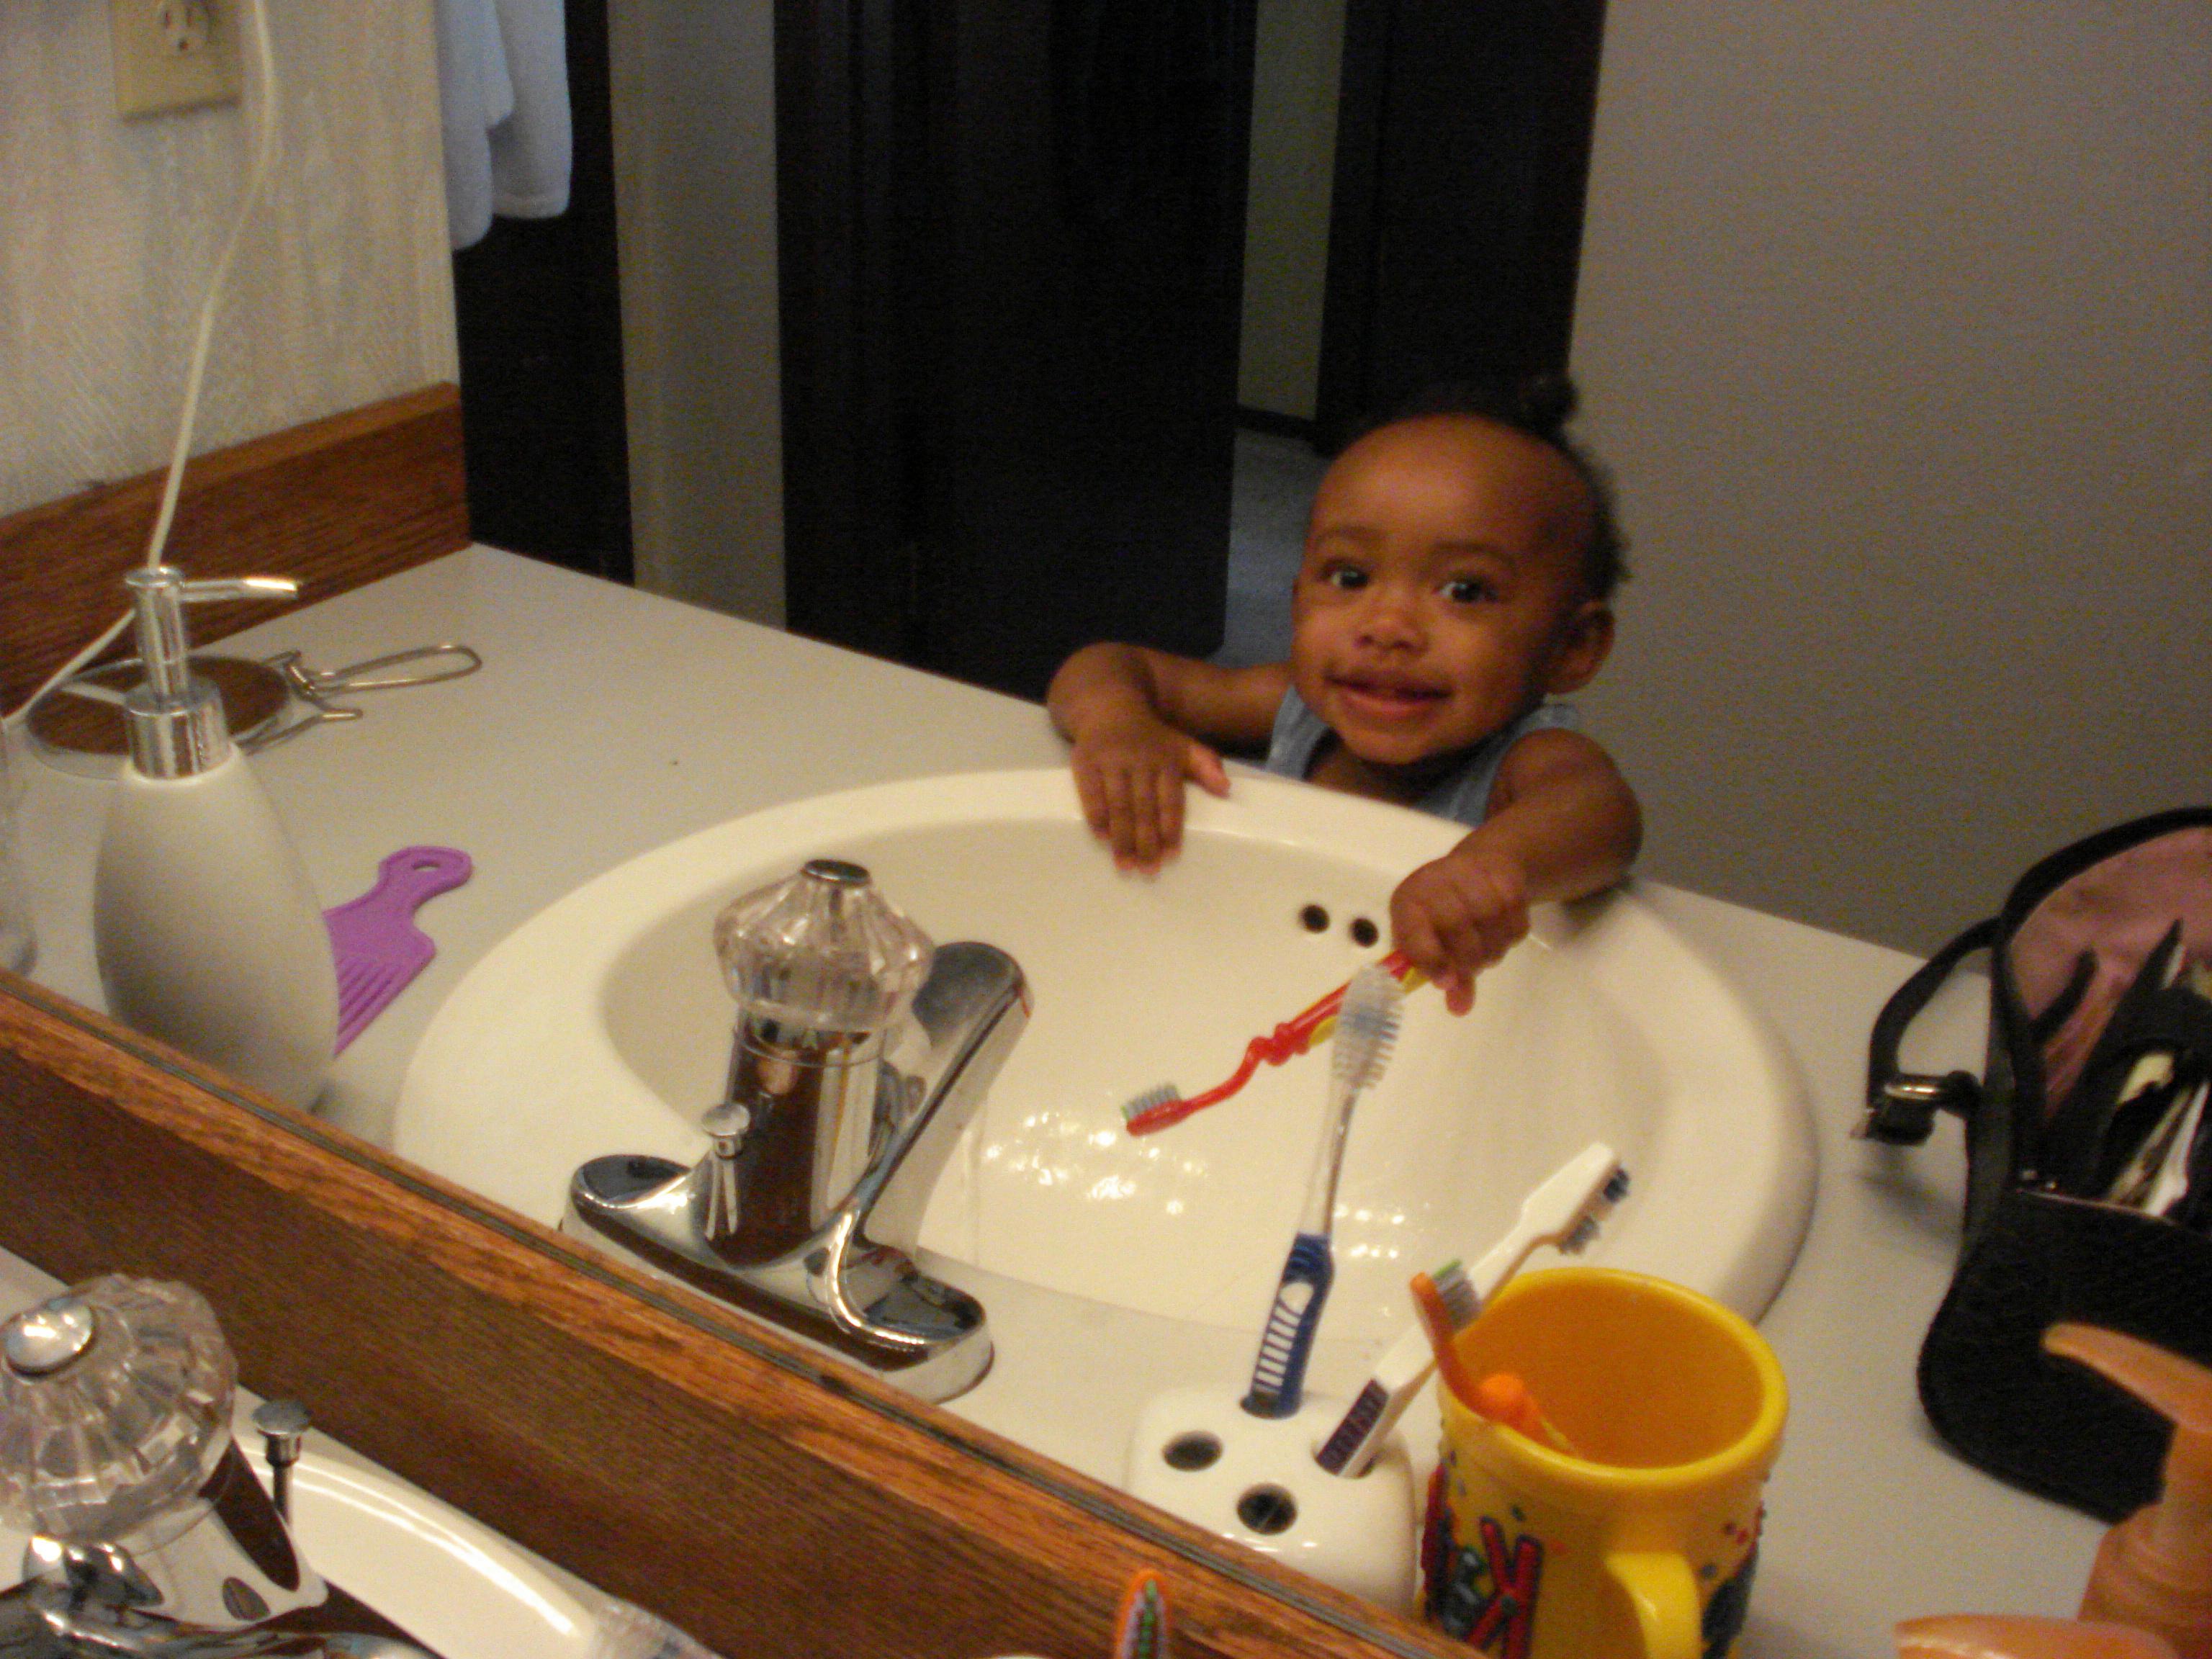 Stephanie brushing teeth